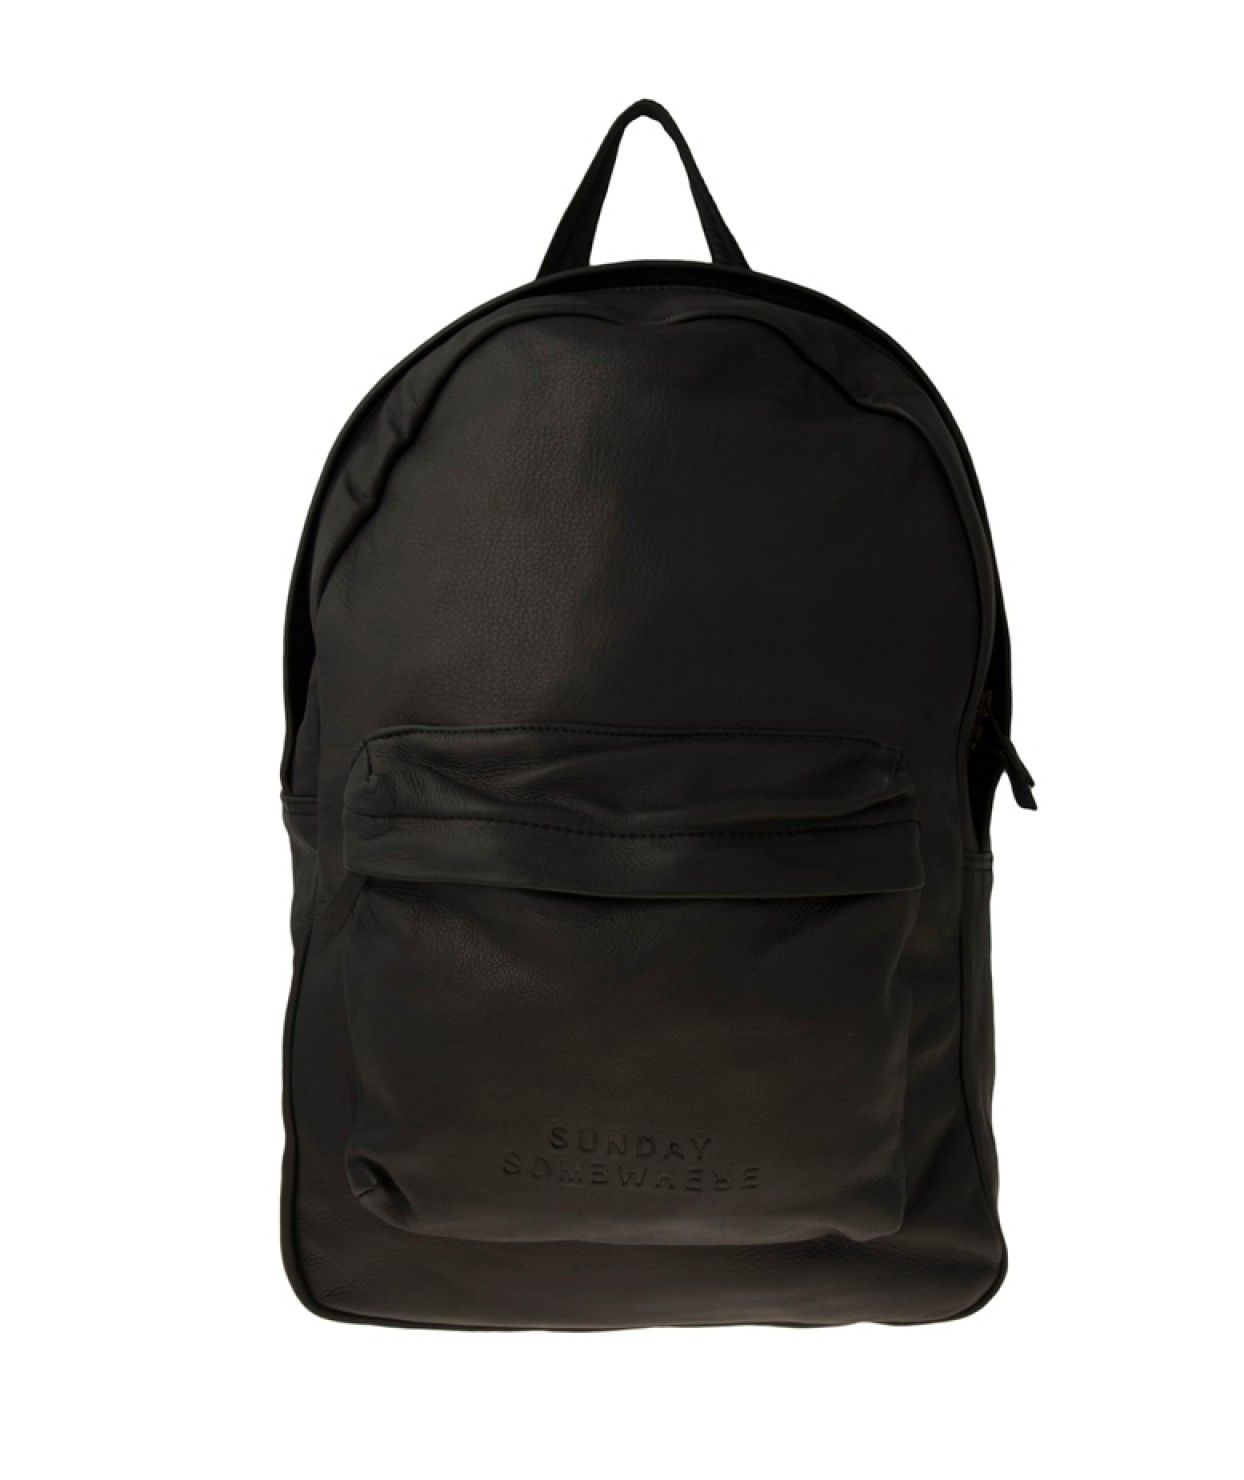 Monday trifecta: backpacks